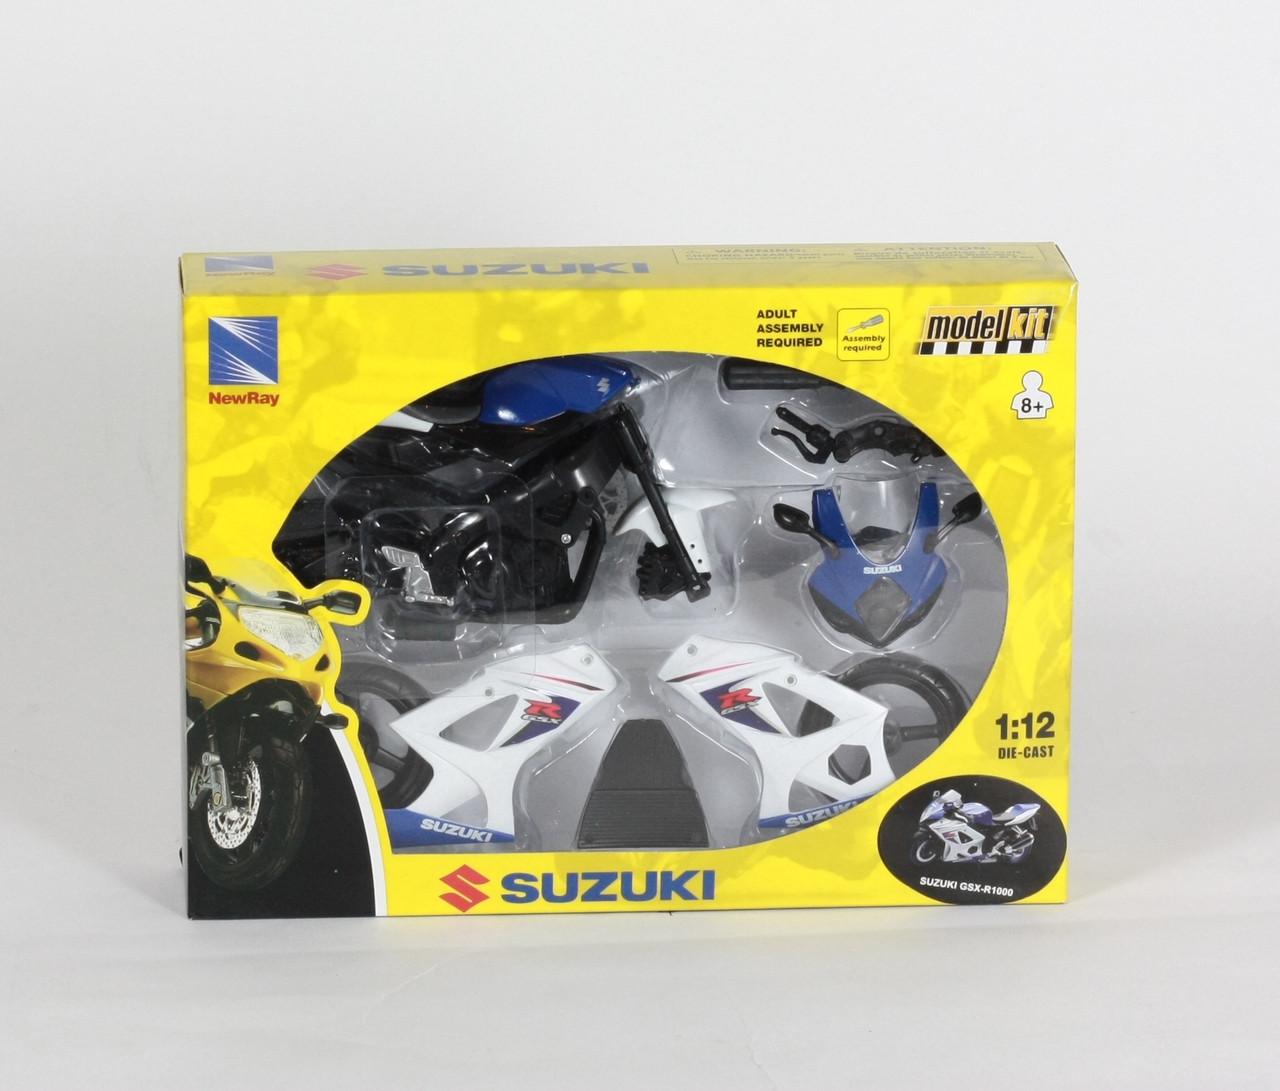 NewRay Мотоцикл сборка (1:12) SUZUKI, 57005